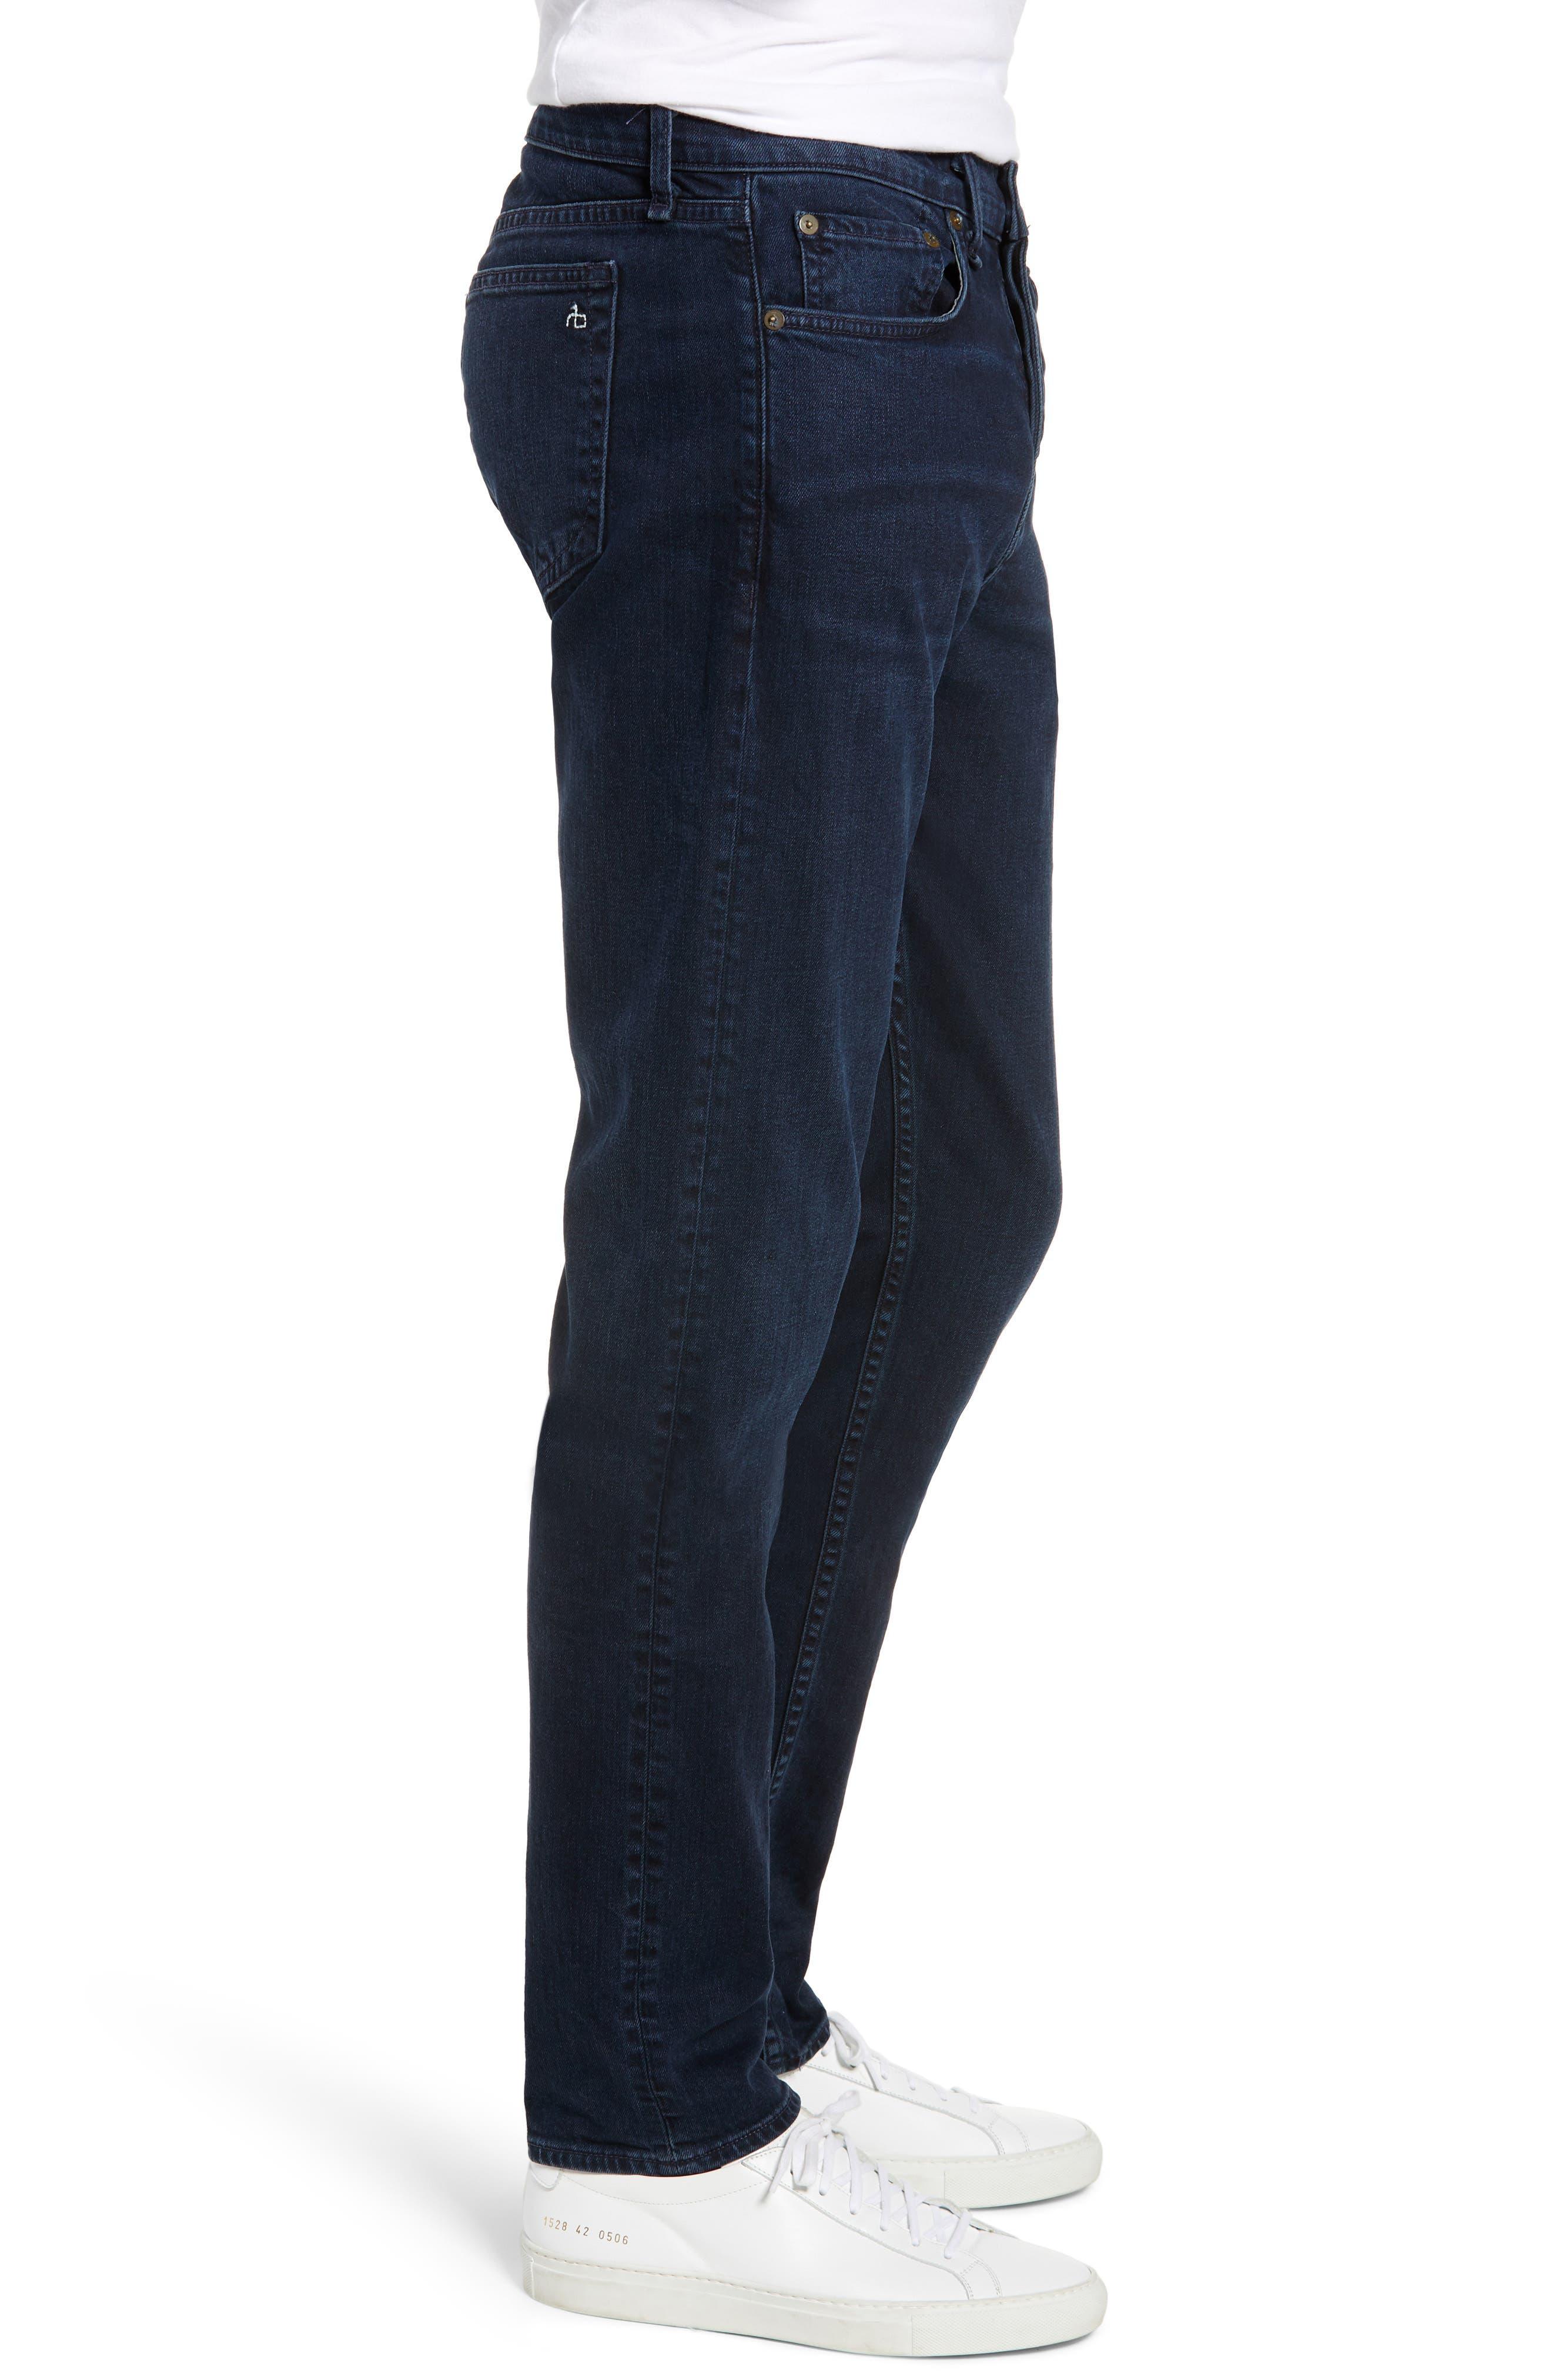 RAG & BONE, Fit 2 Slim Fit Jeans, Alternate thumbnail 4, color, BAYVIEW